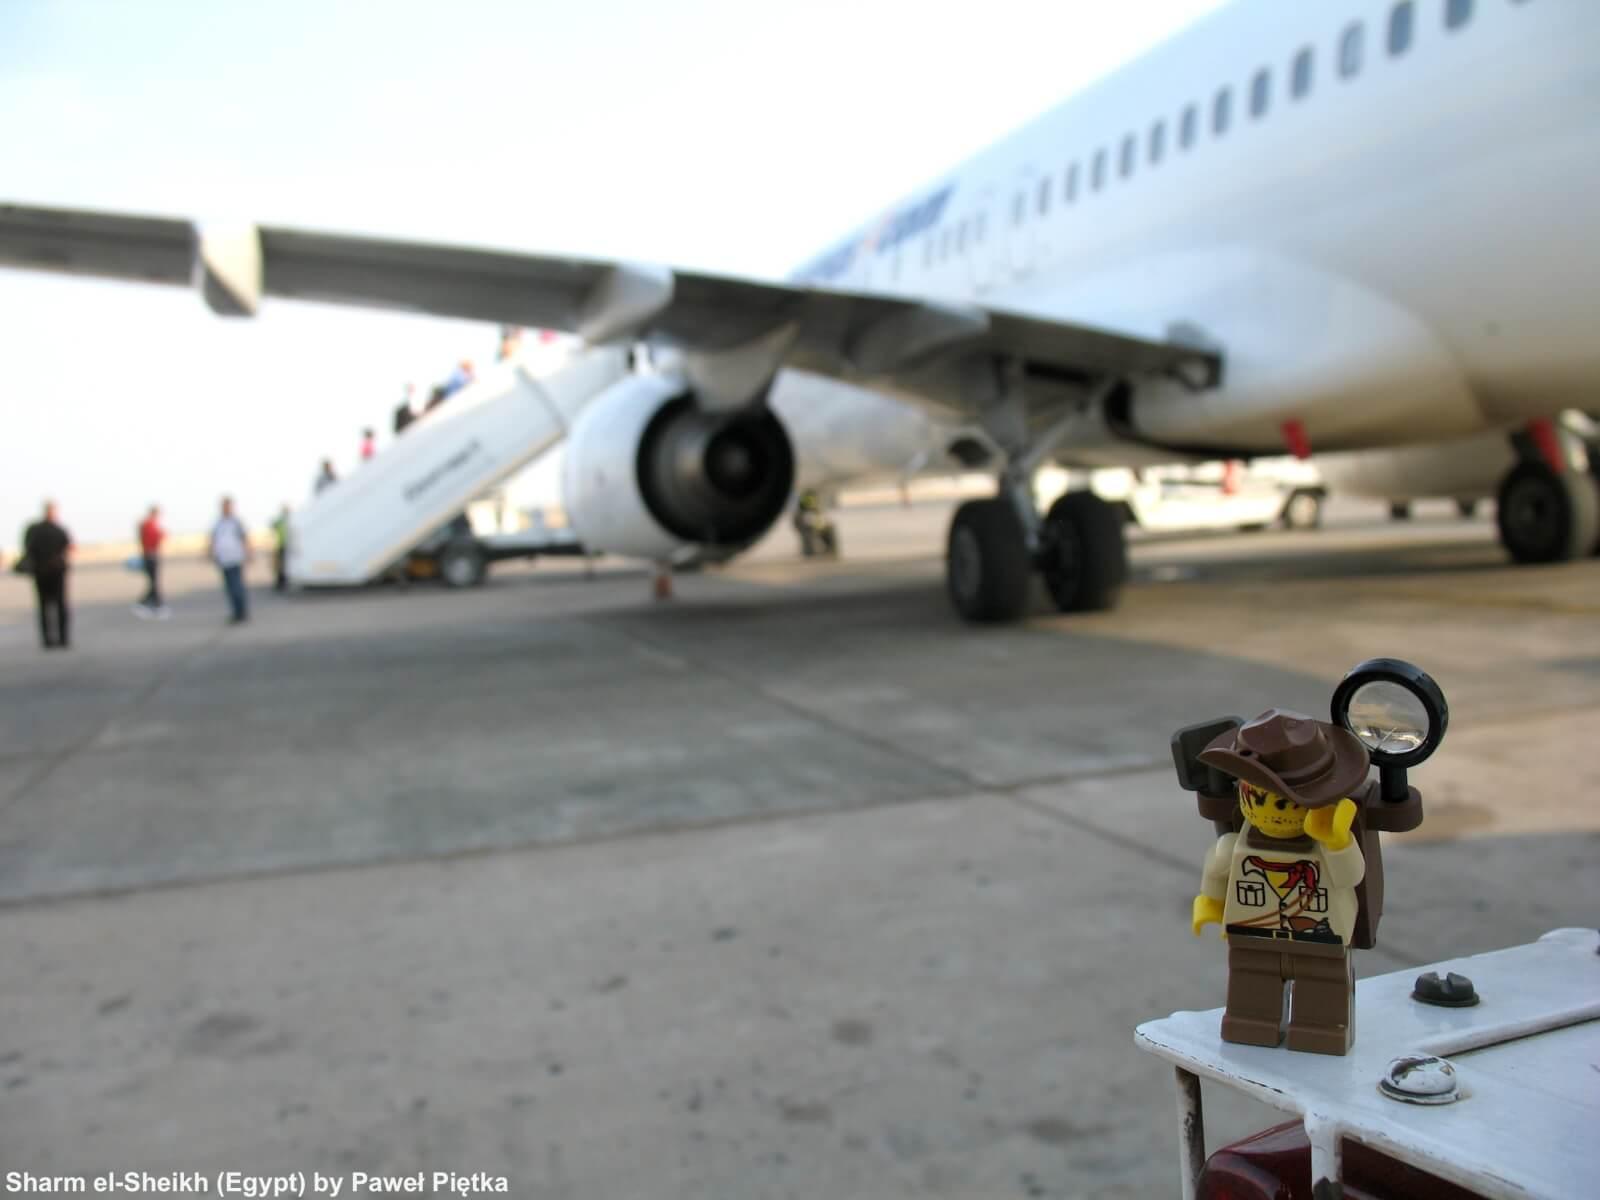 Sharm el-Sheikh (Egypt) - International Airport 2